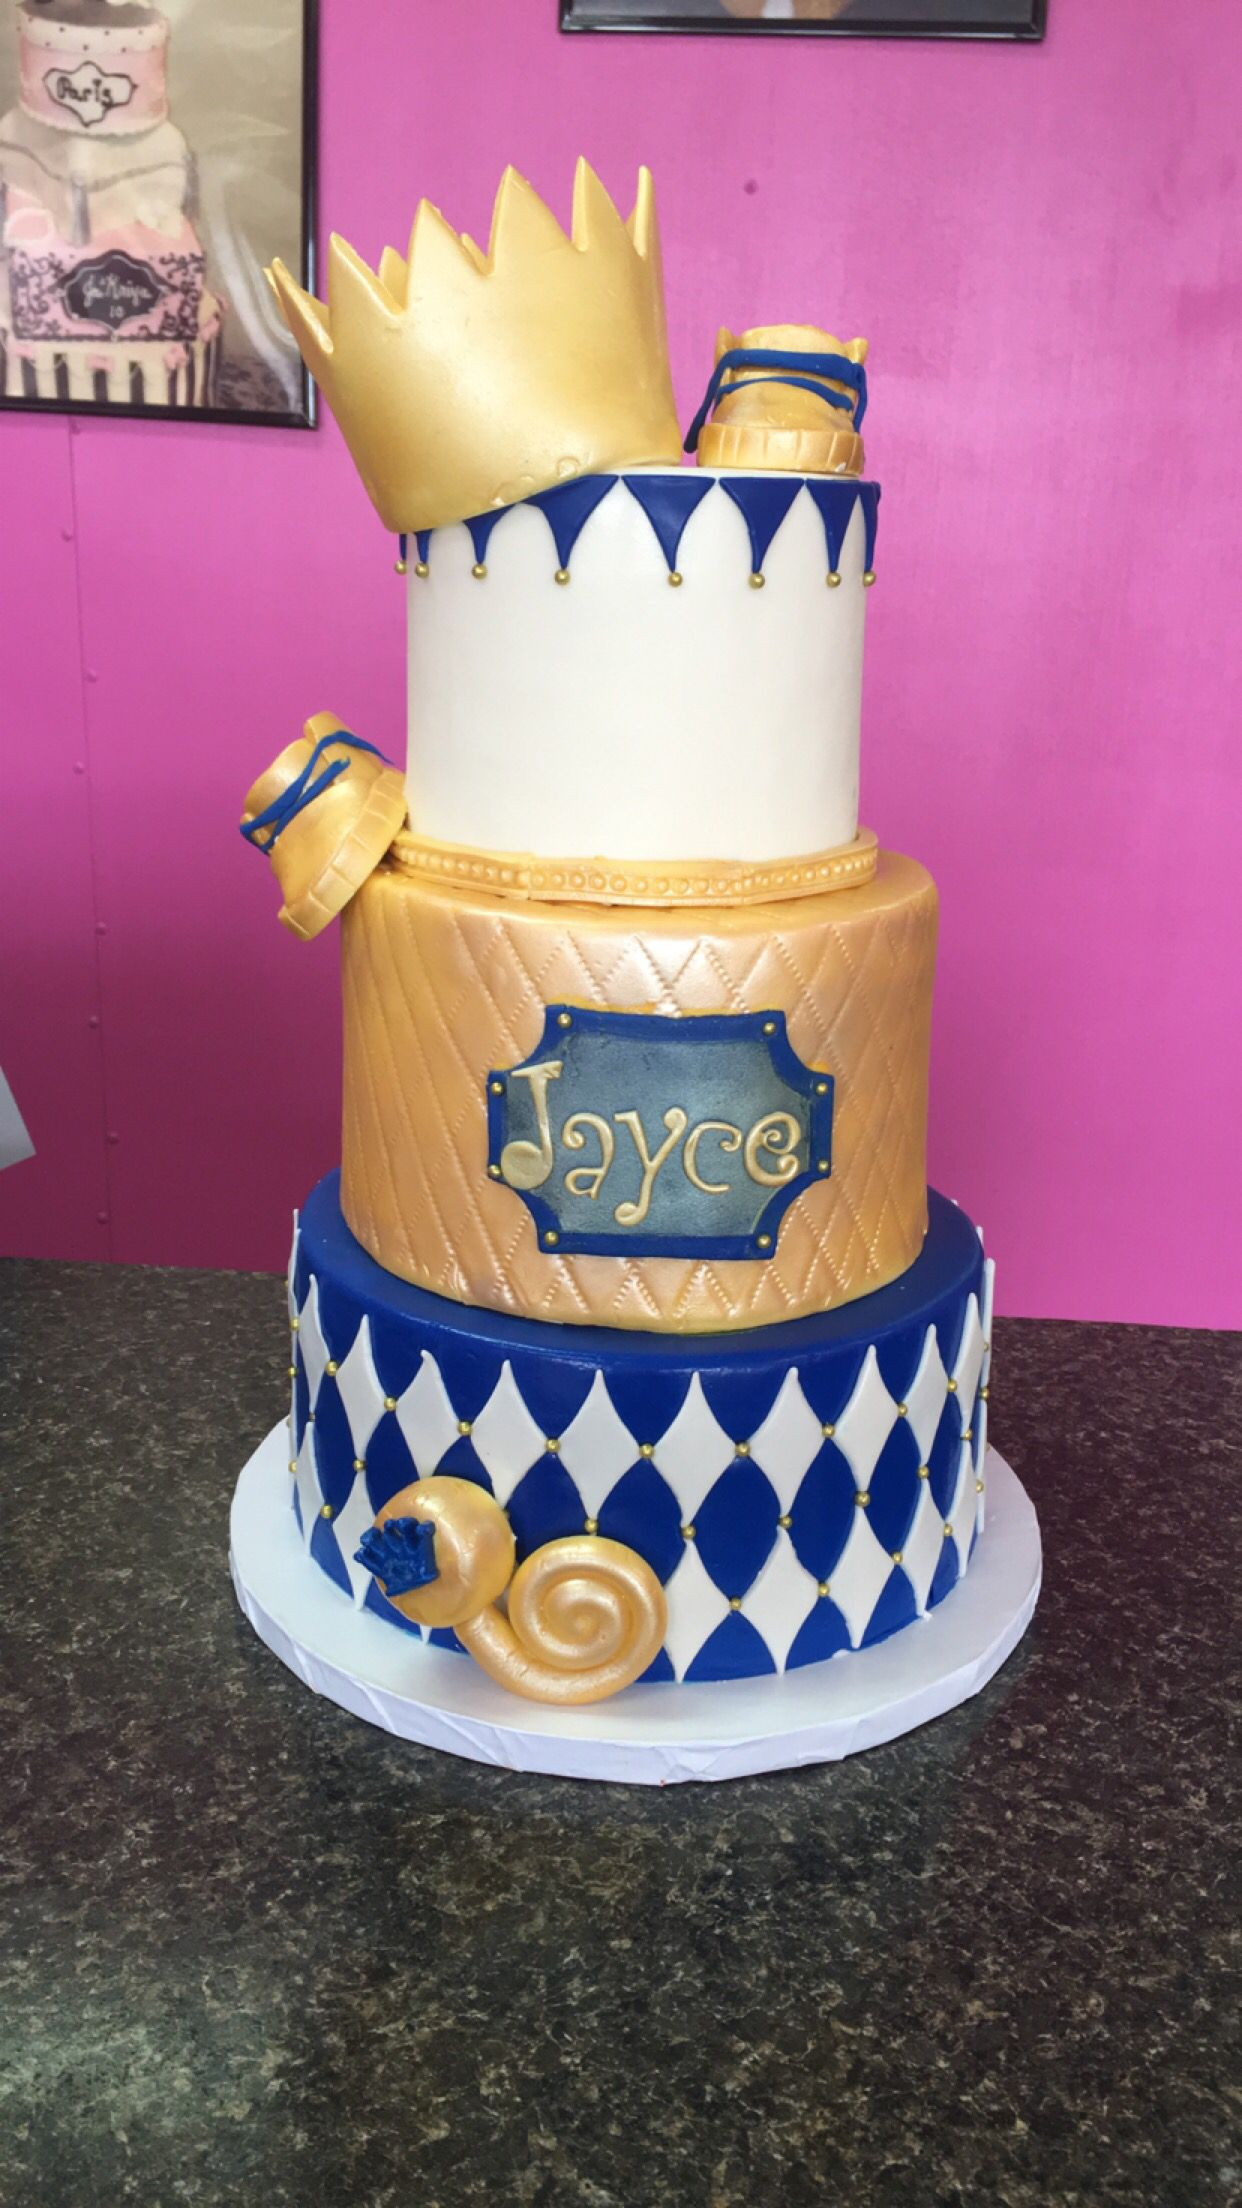 Royal Blue, Gold, And White Baby Shower Cake. #RoyalPrinceCake  #RoyalBabyShower #